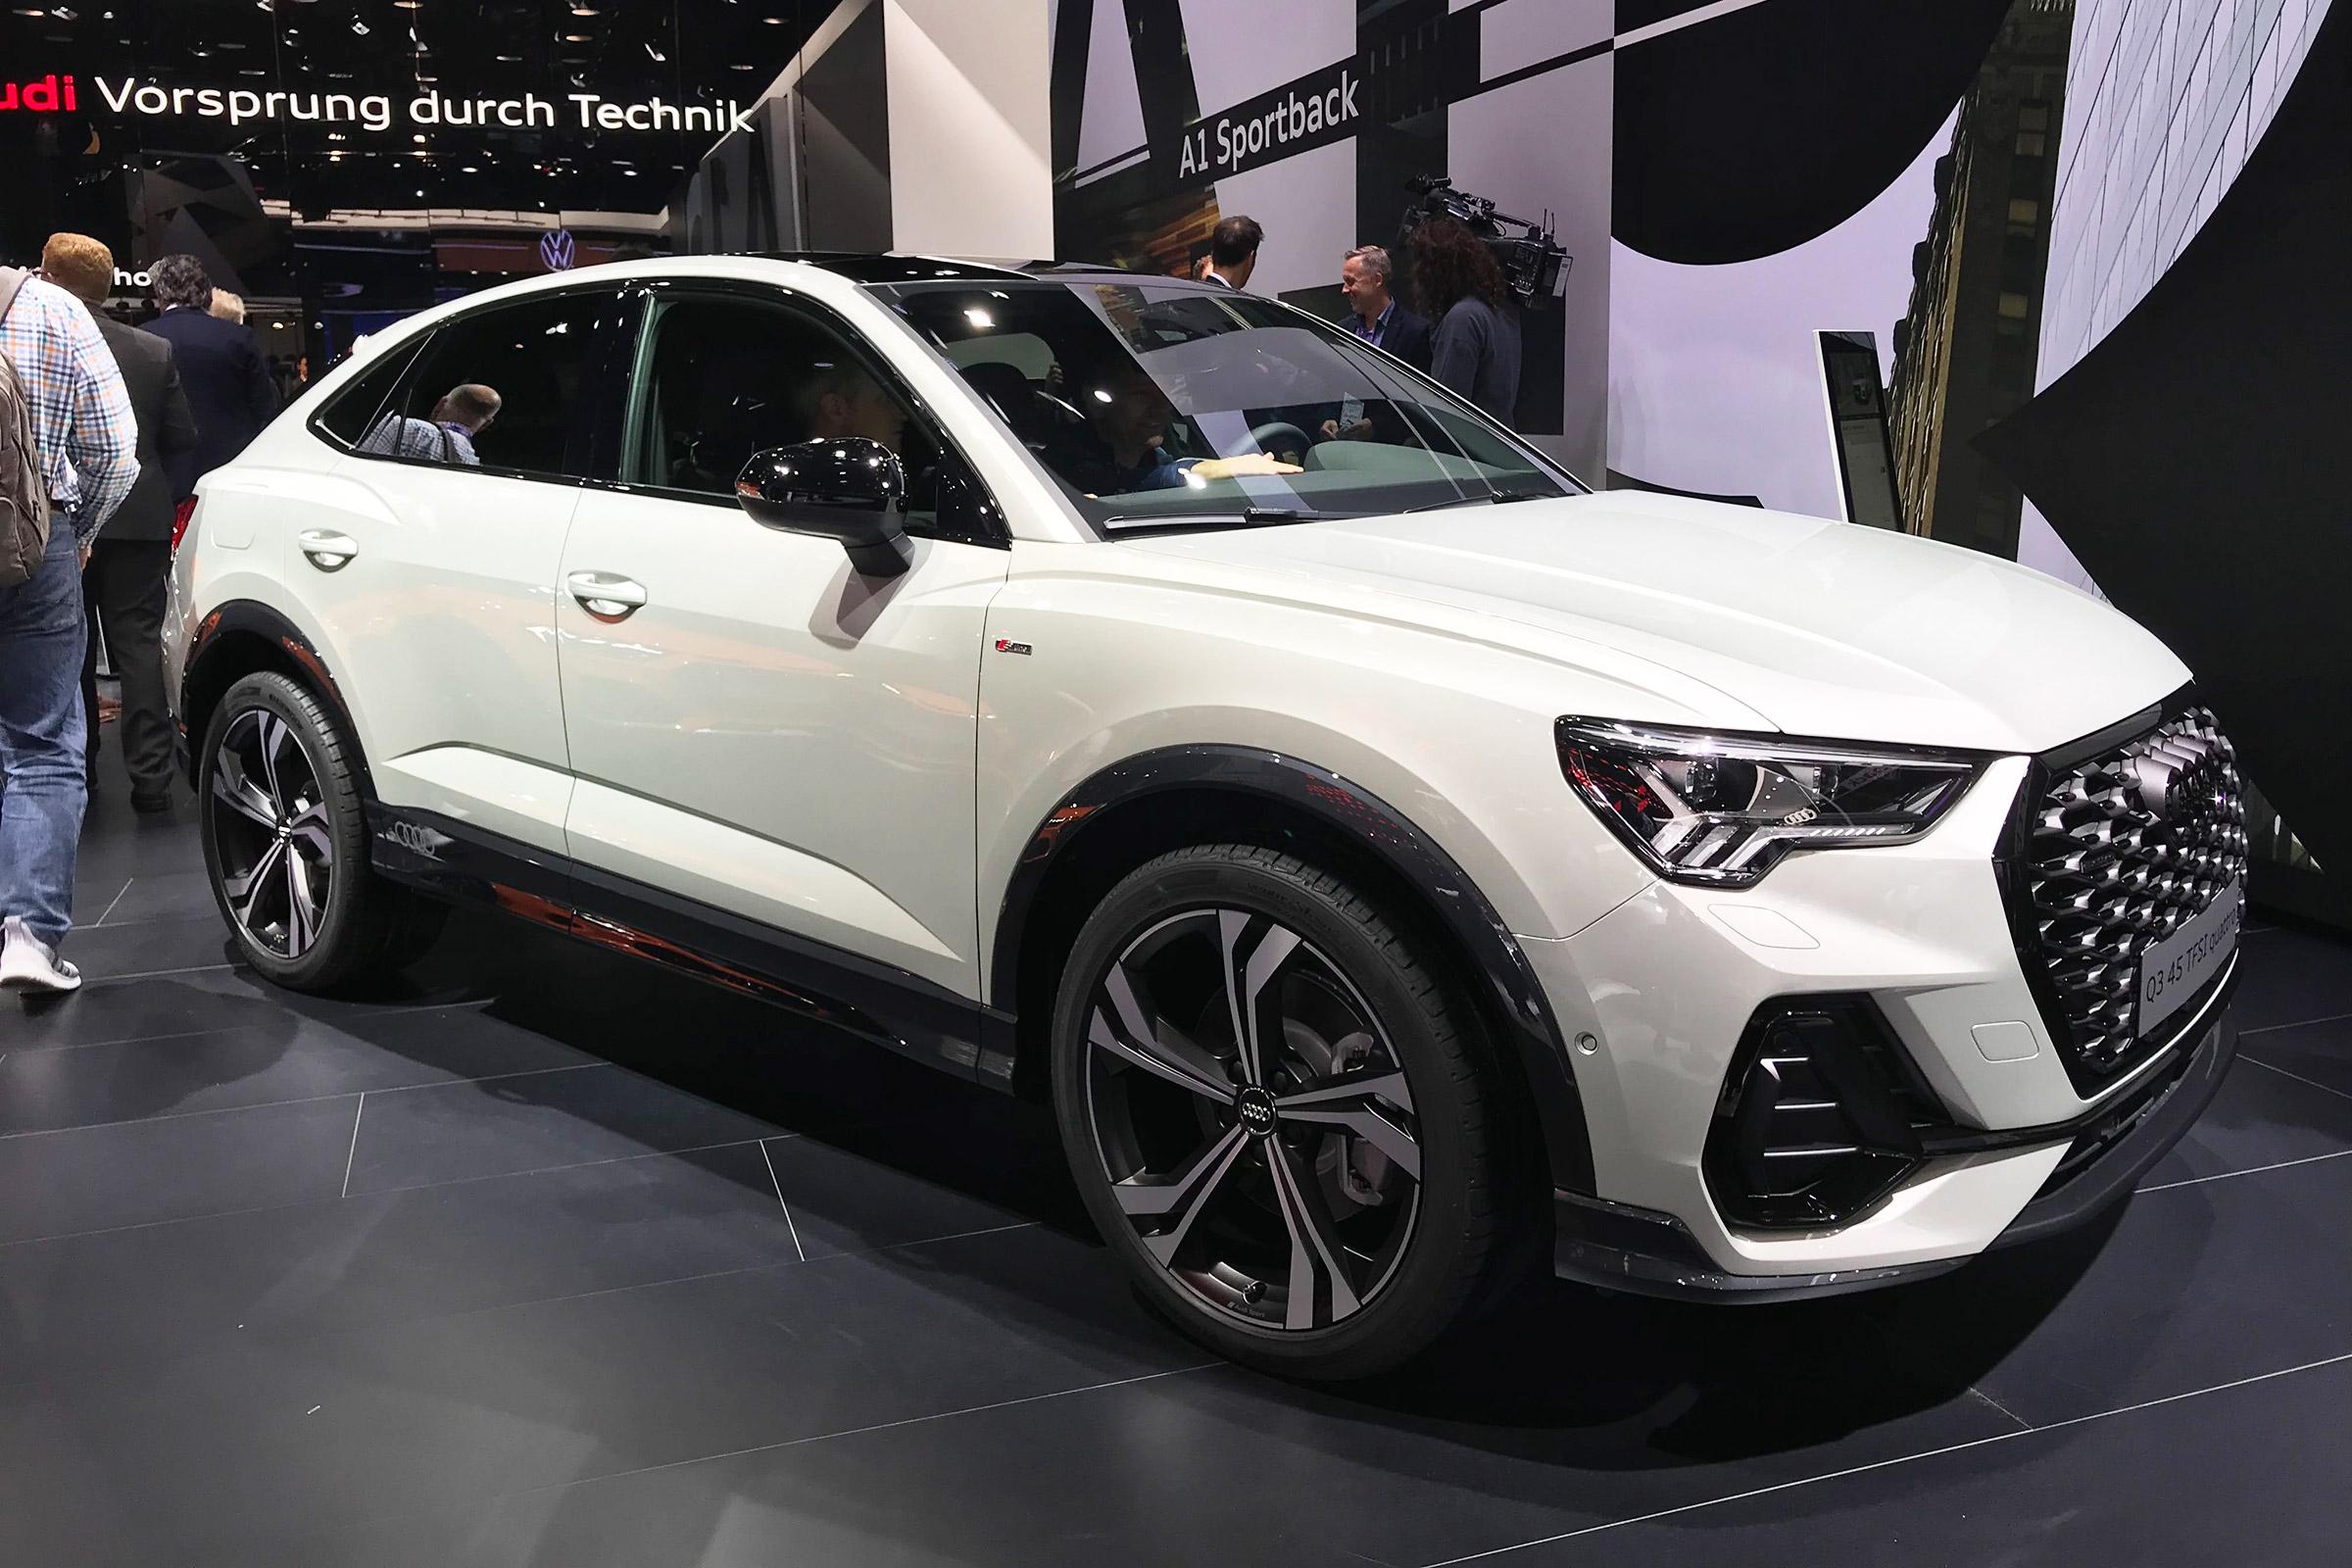 New 2019 Audi Q3 Sportback Joins Brand S Growing Suv Range Auto Express